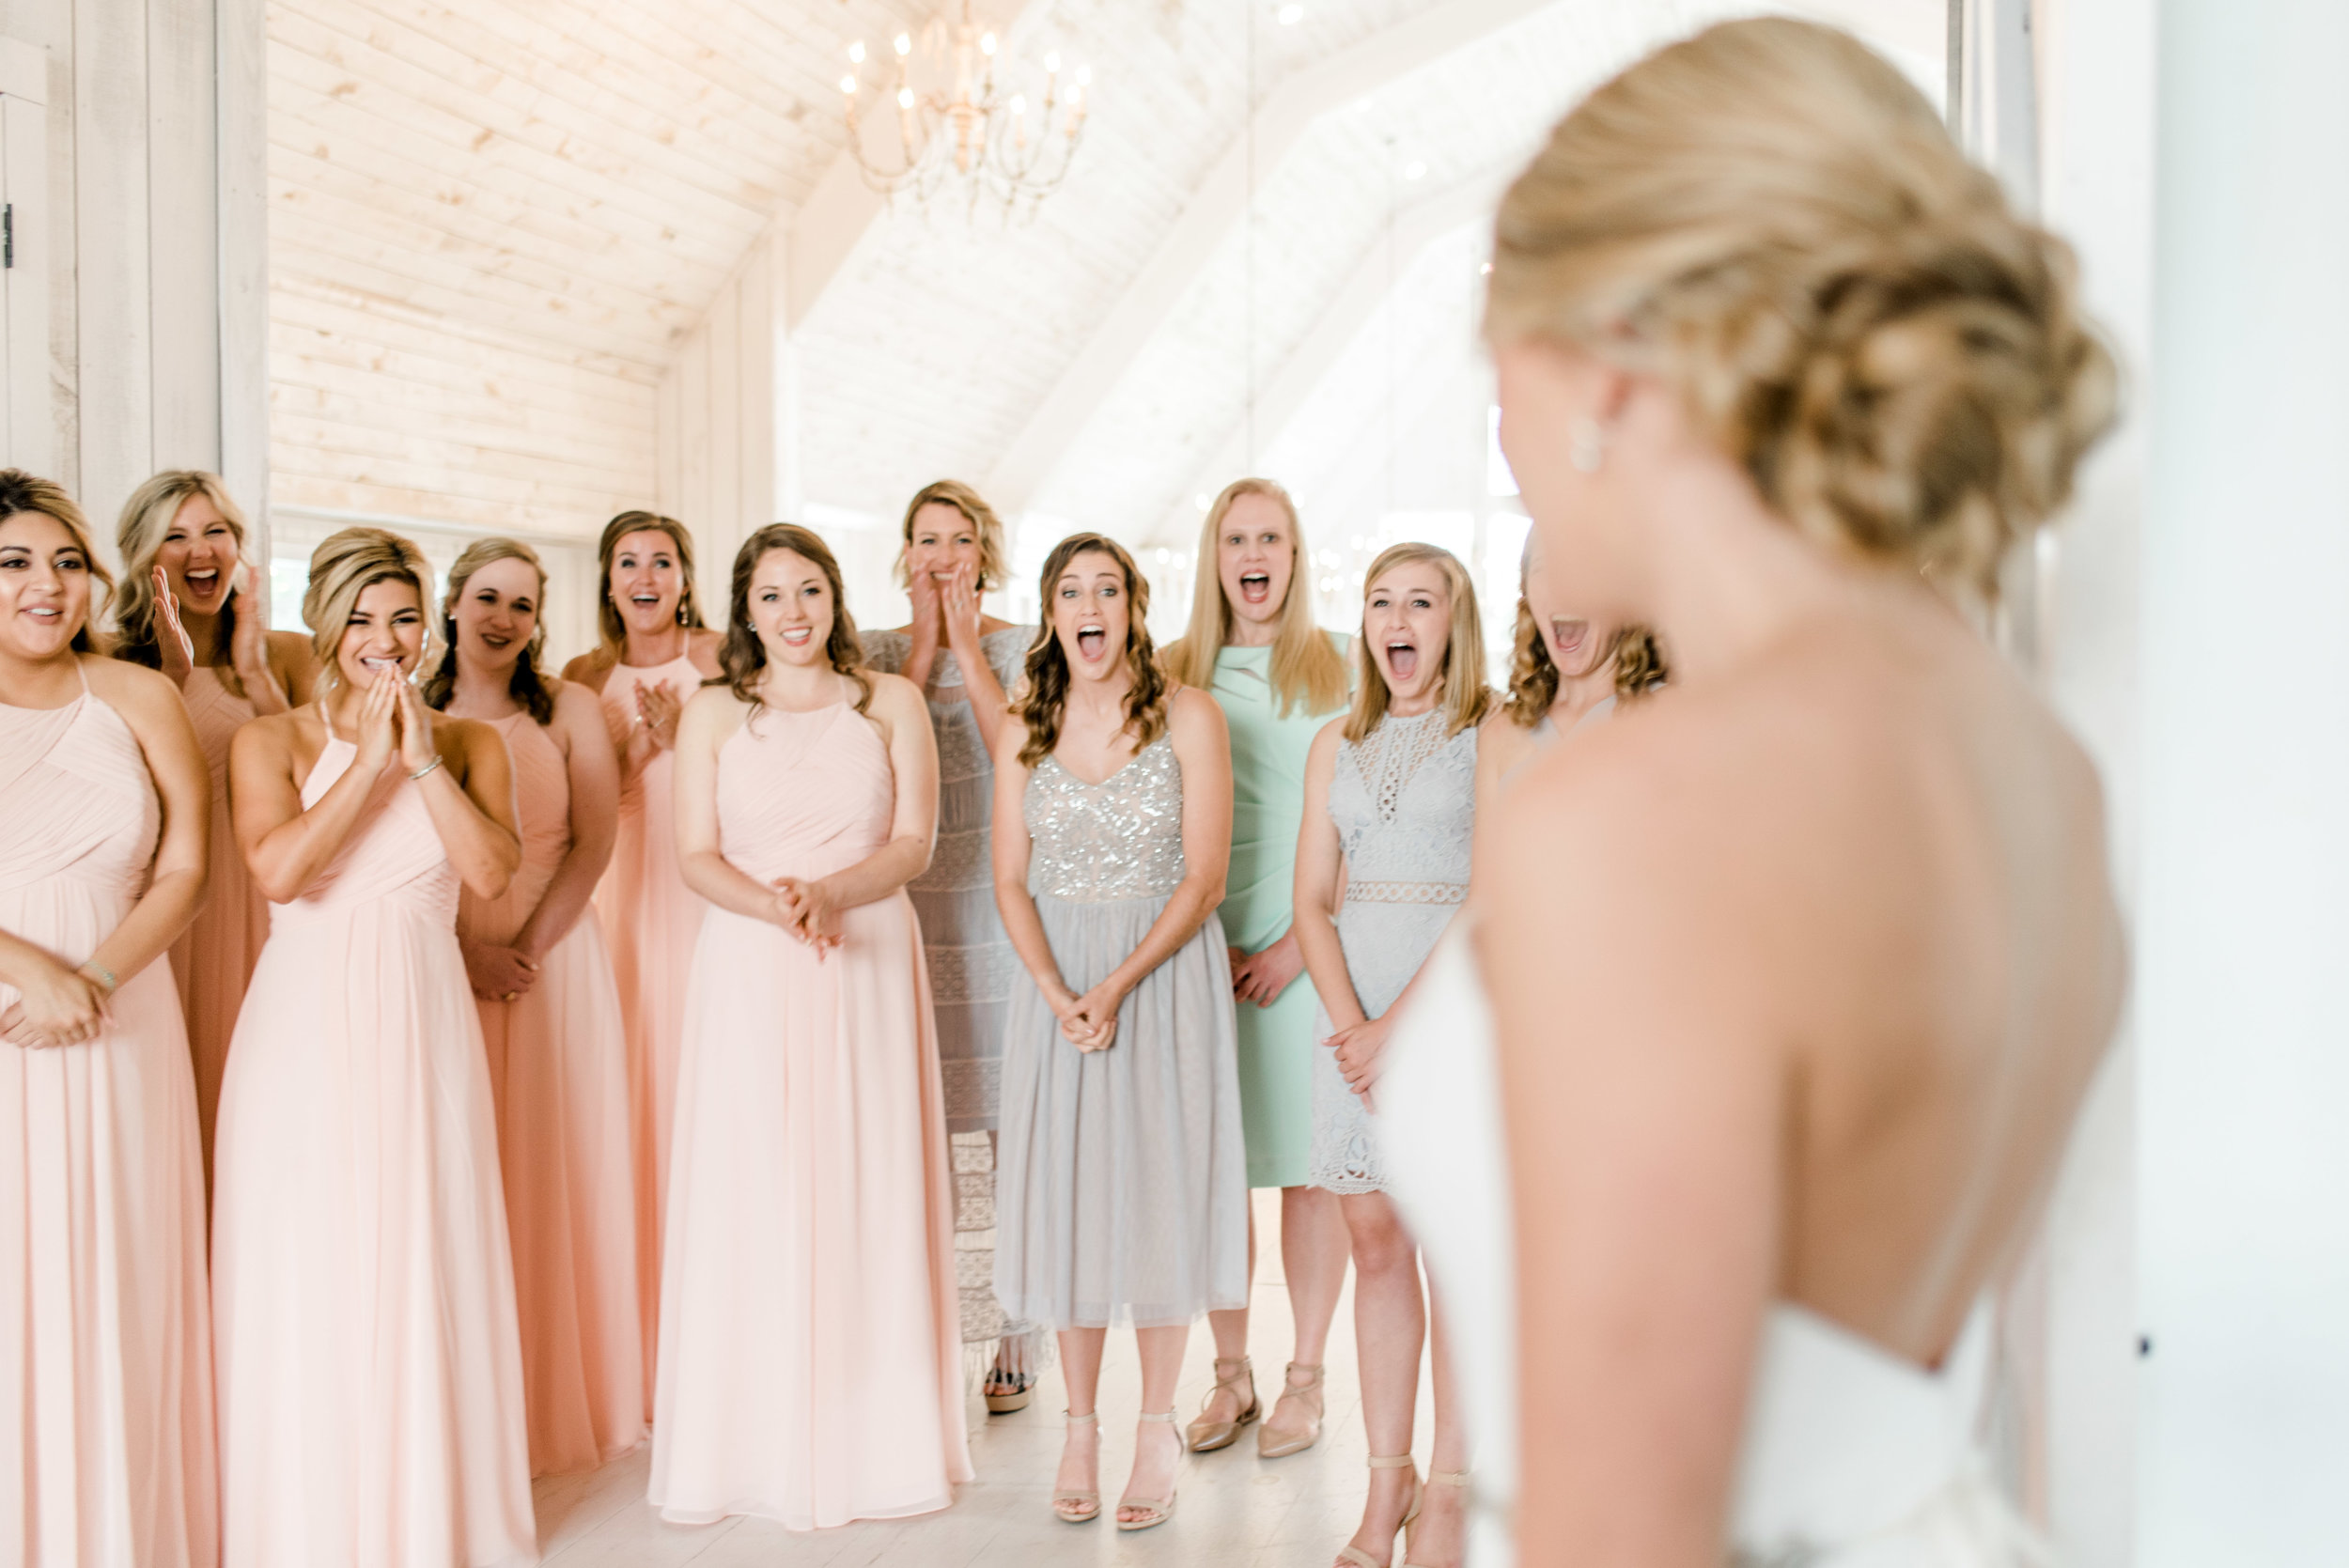 gray-door-photography-wedding-portraits-dallas-photographer-steph-erffmeyer8.jpg